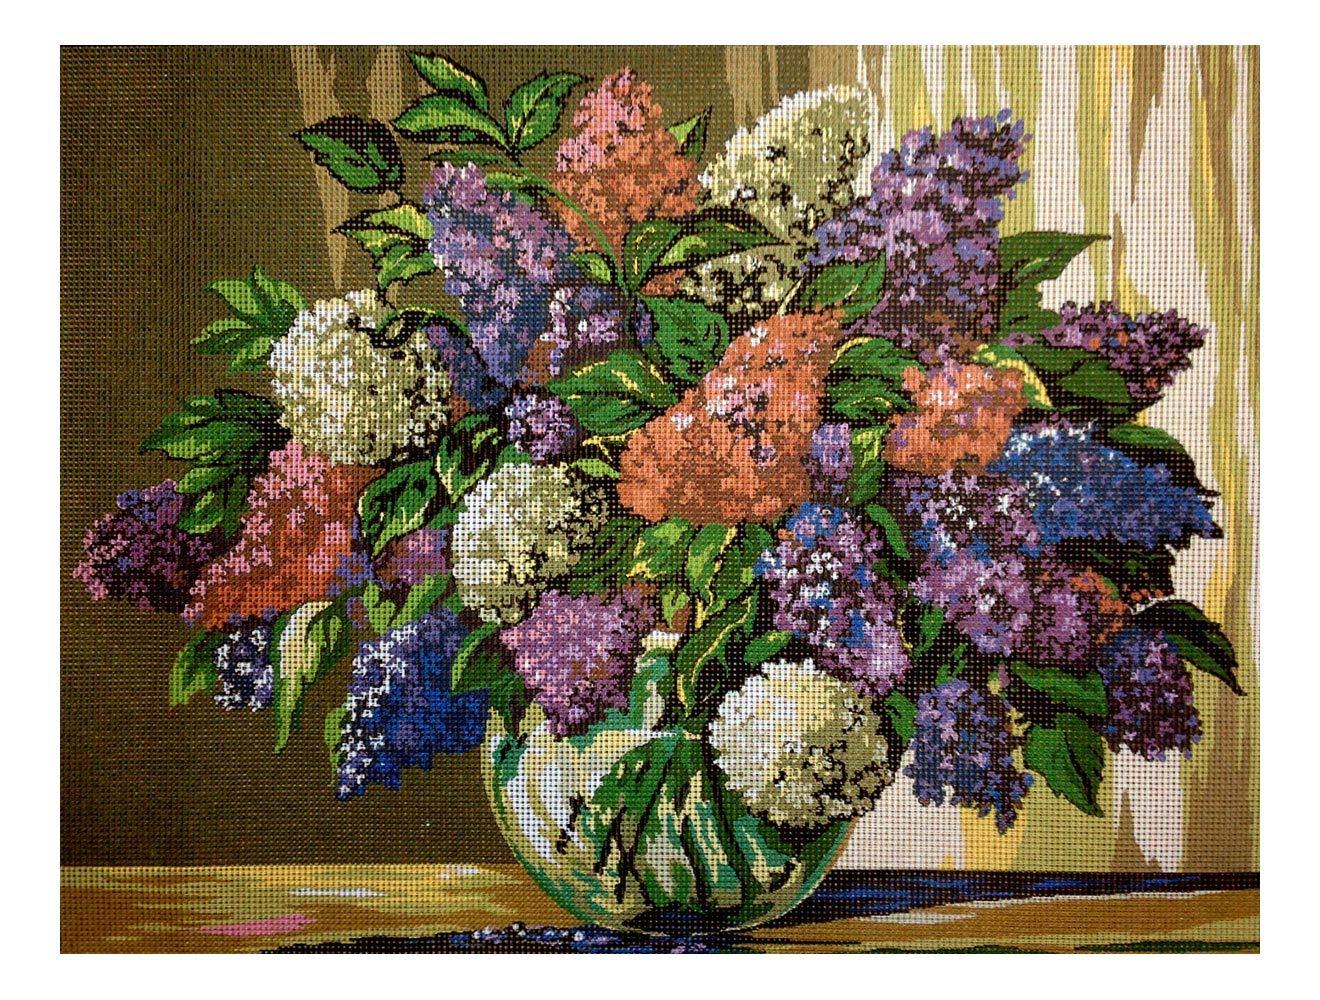 Aidalux Needlepoint Kit Lilac Flowers 15.7x11.8 (40x30cm) Printed Canvas 054 Hudemas